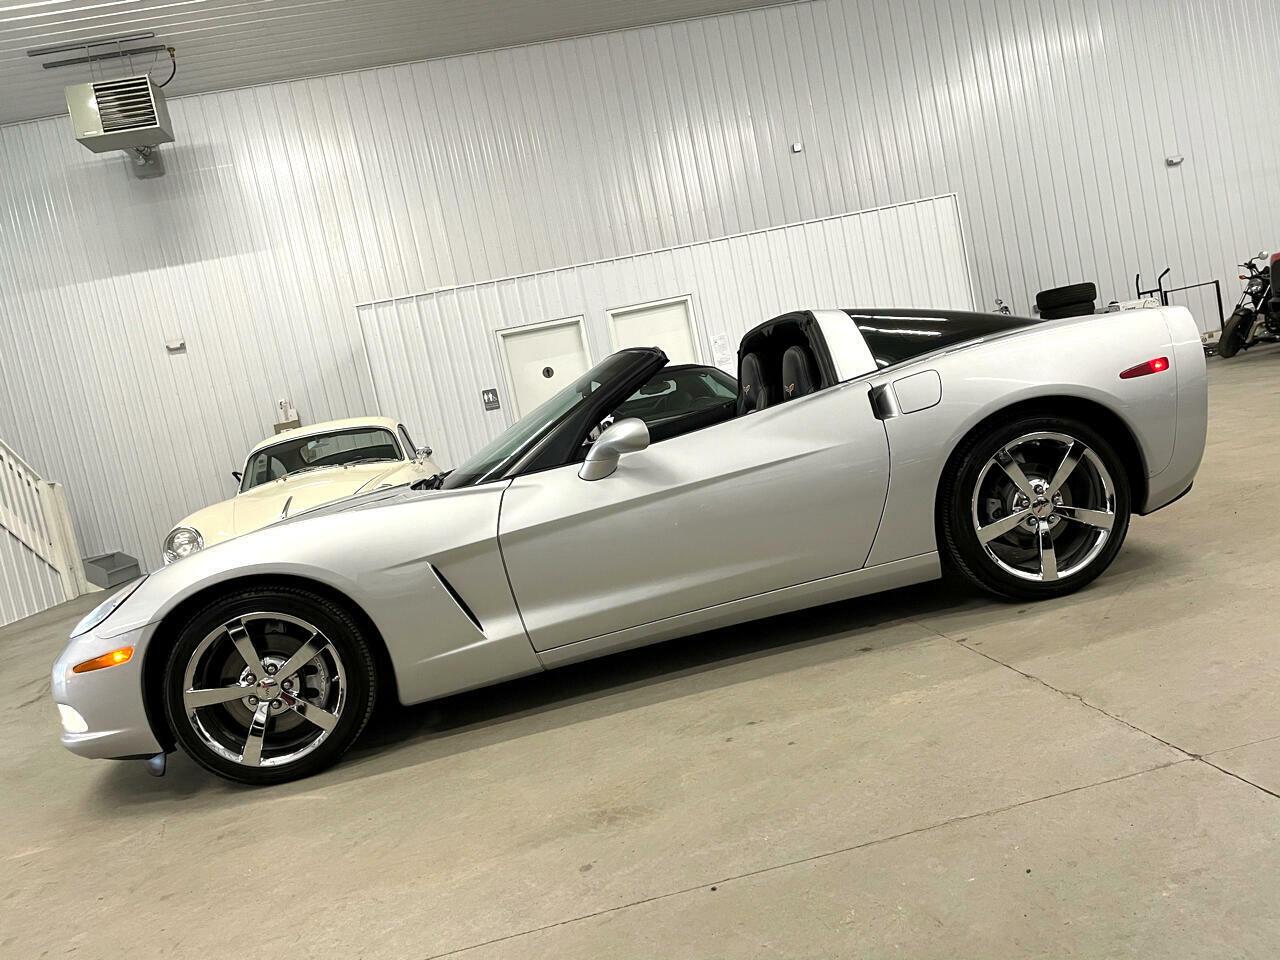 2010 Silver Chevrolet Corvette   | C6 Corvette Photo 4